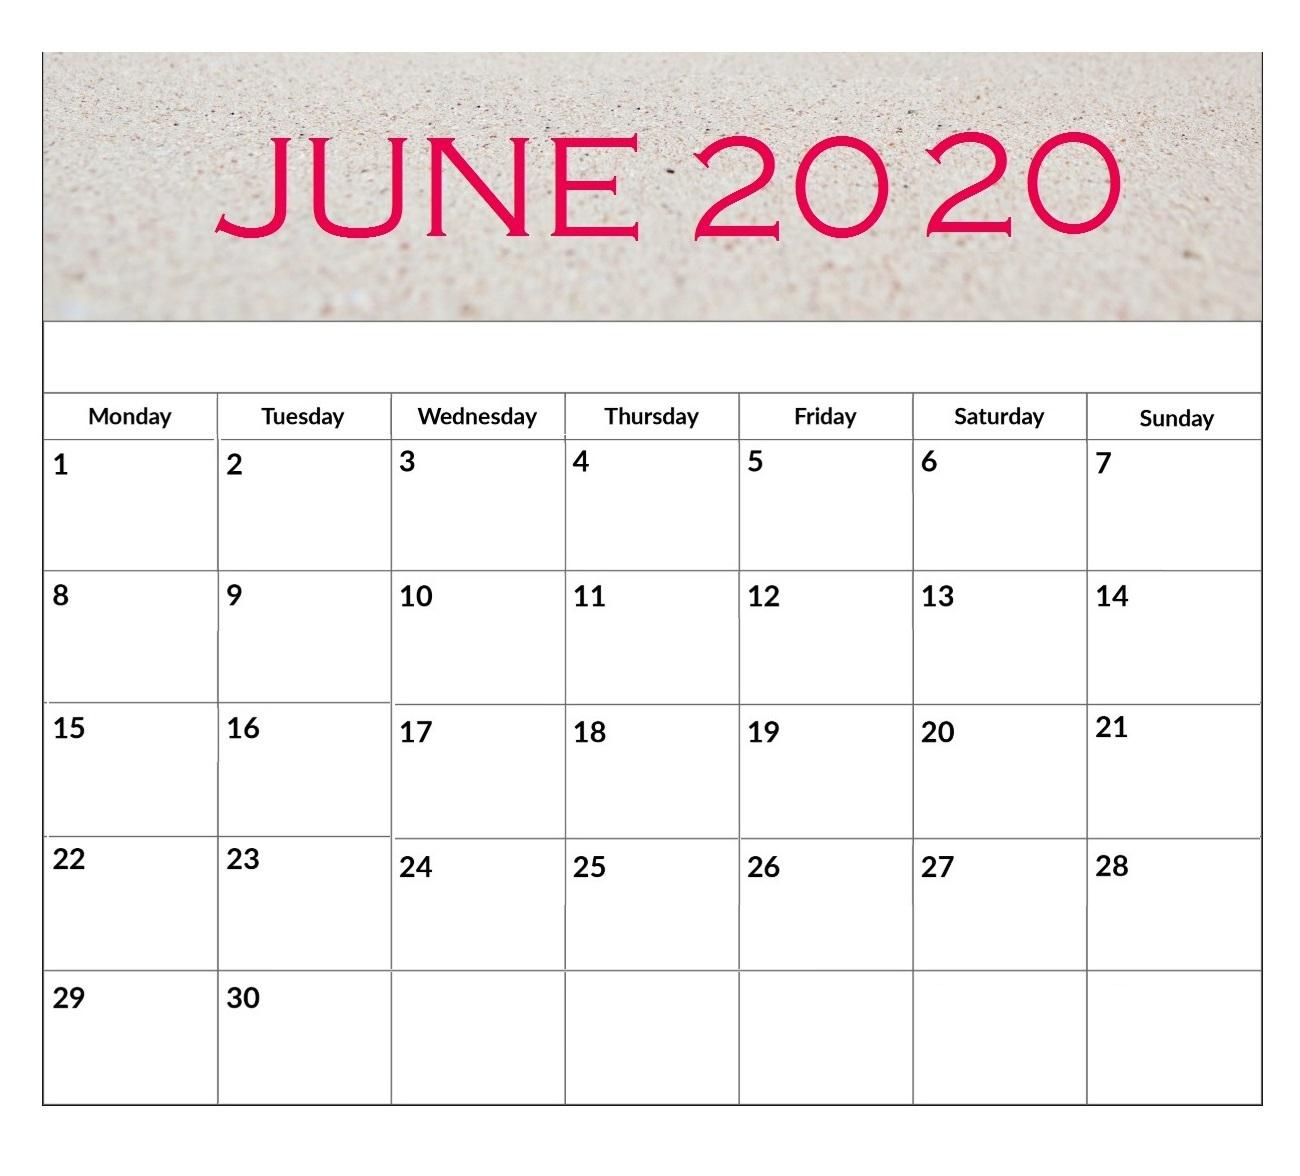 Free June 2020 Desk Calendar | Calendar 2019